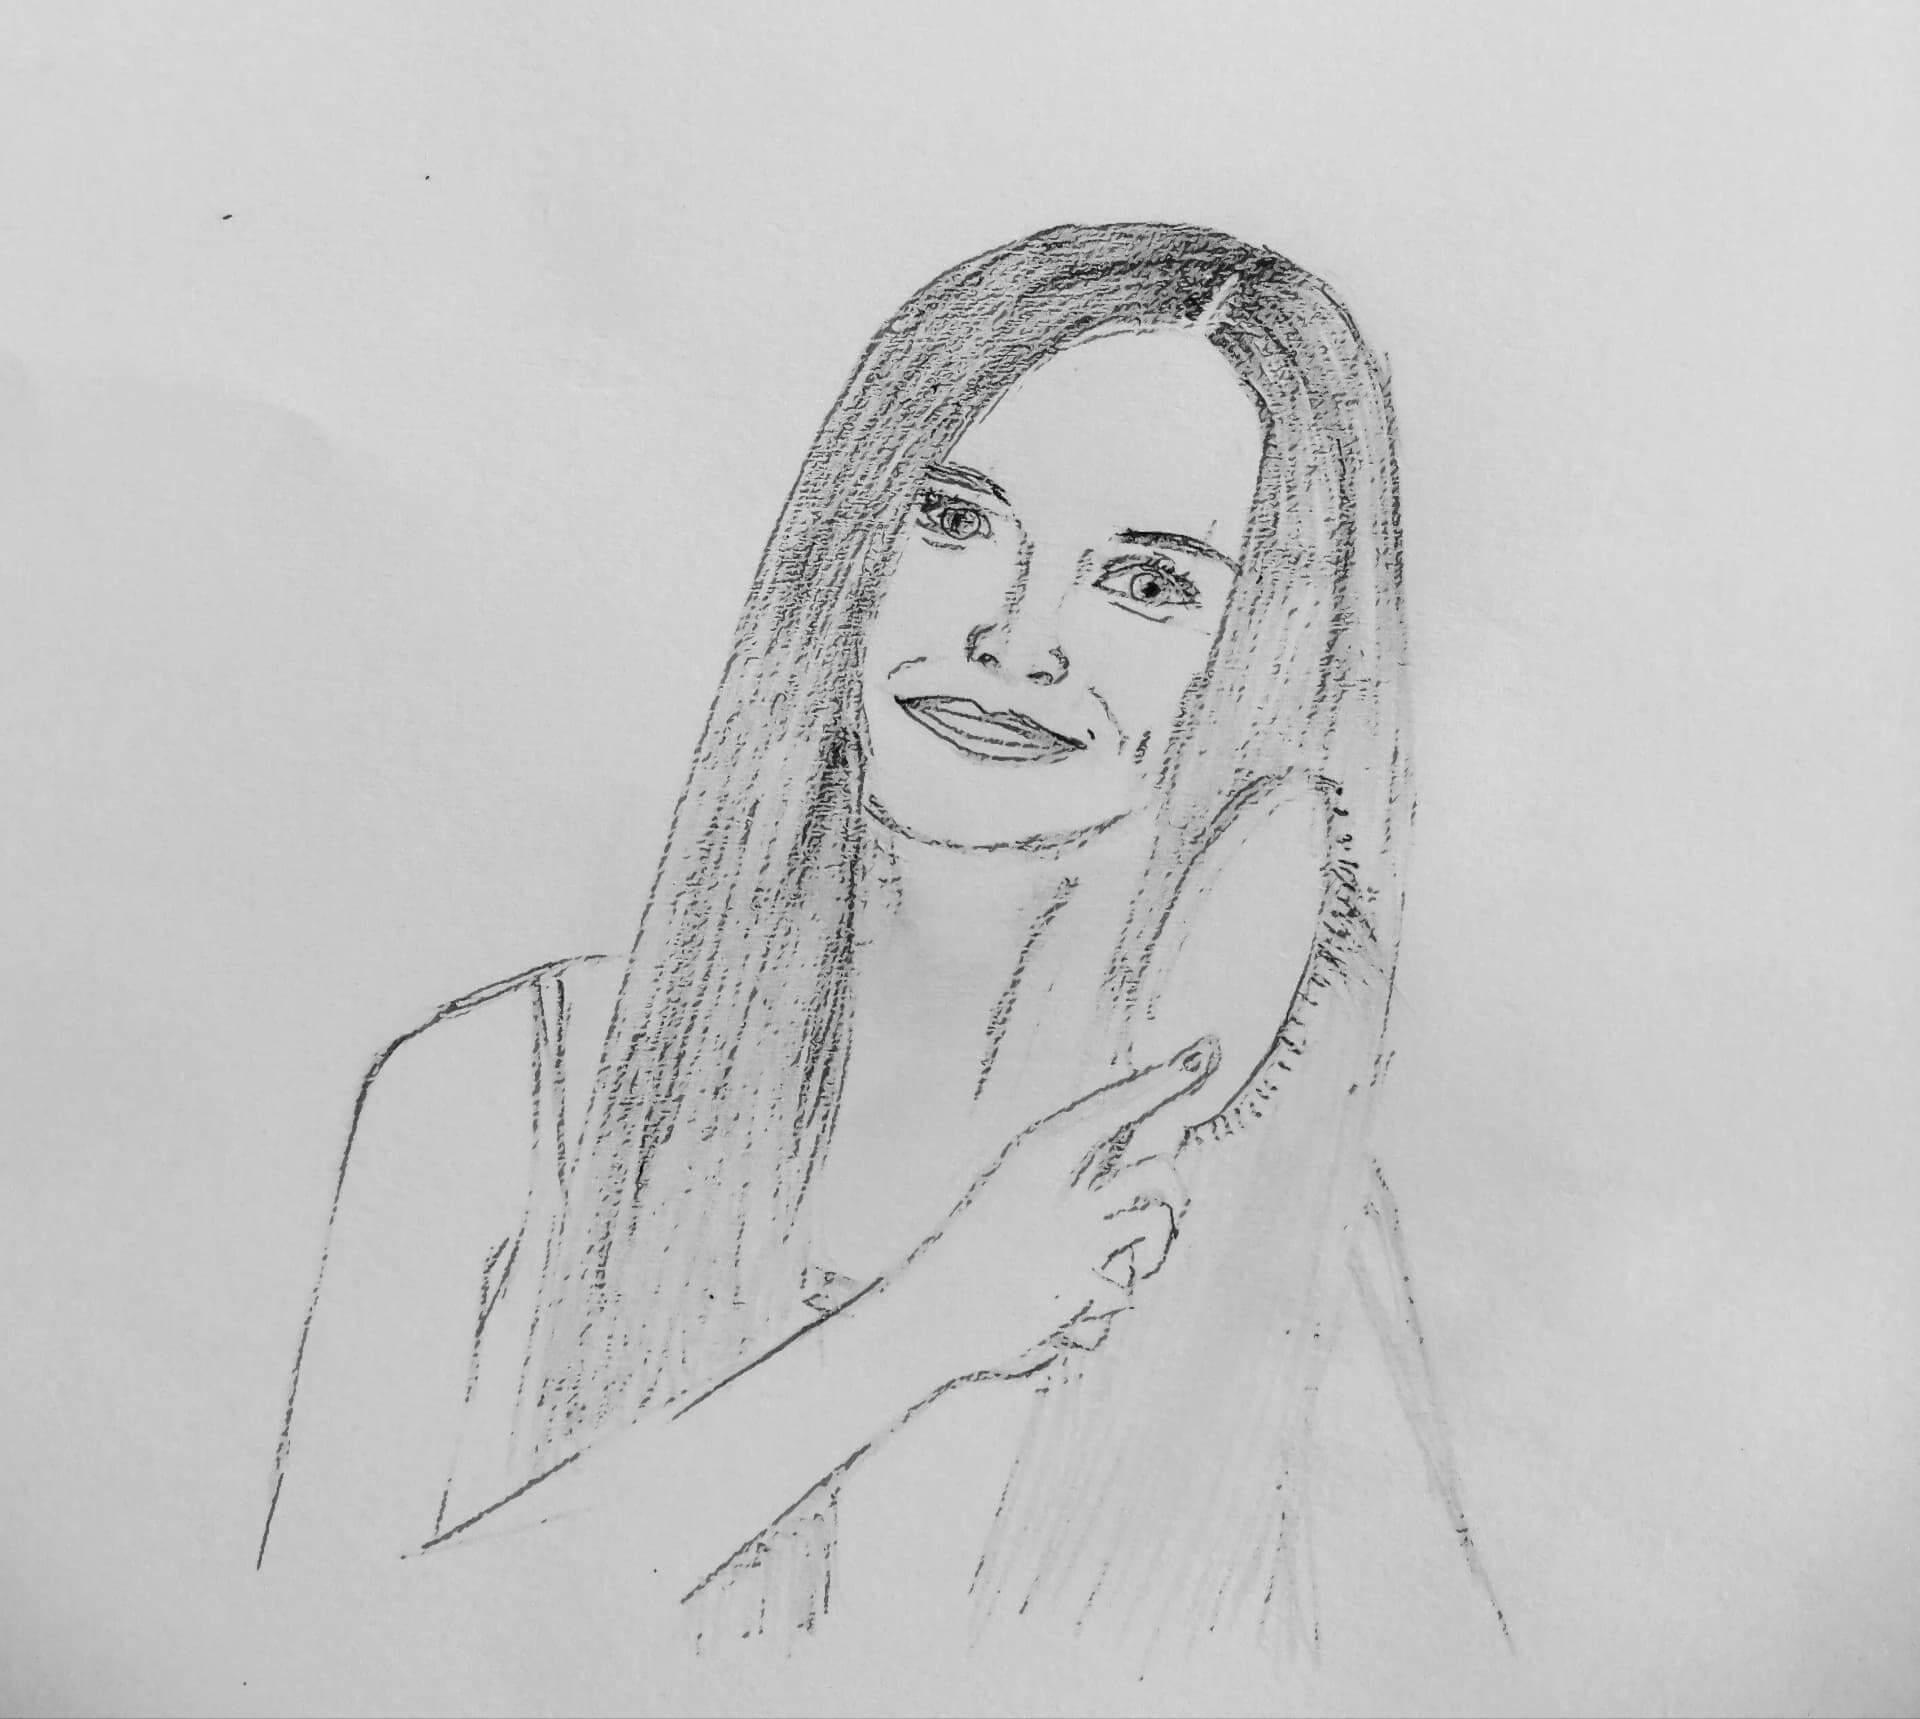 sketch-of-girl-brushing-her-hair